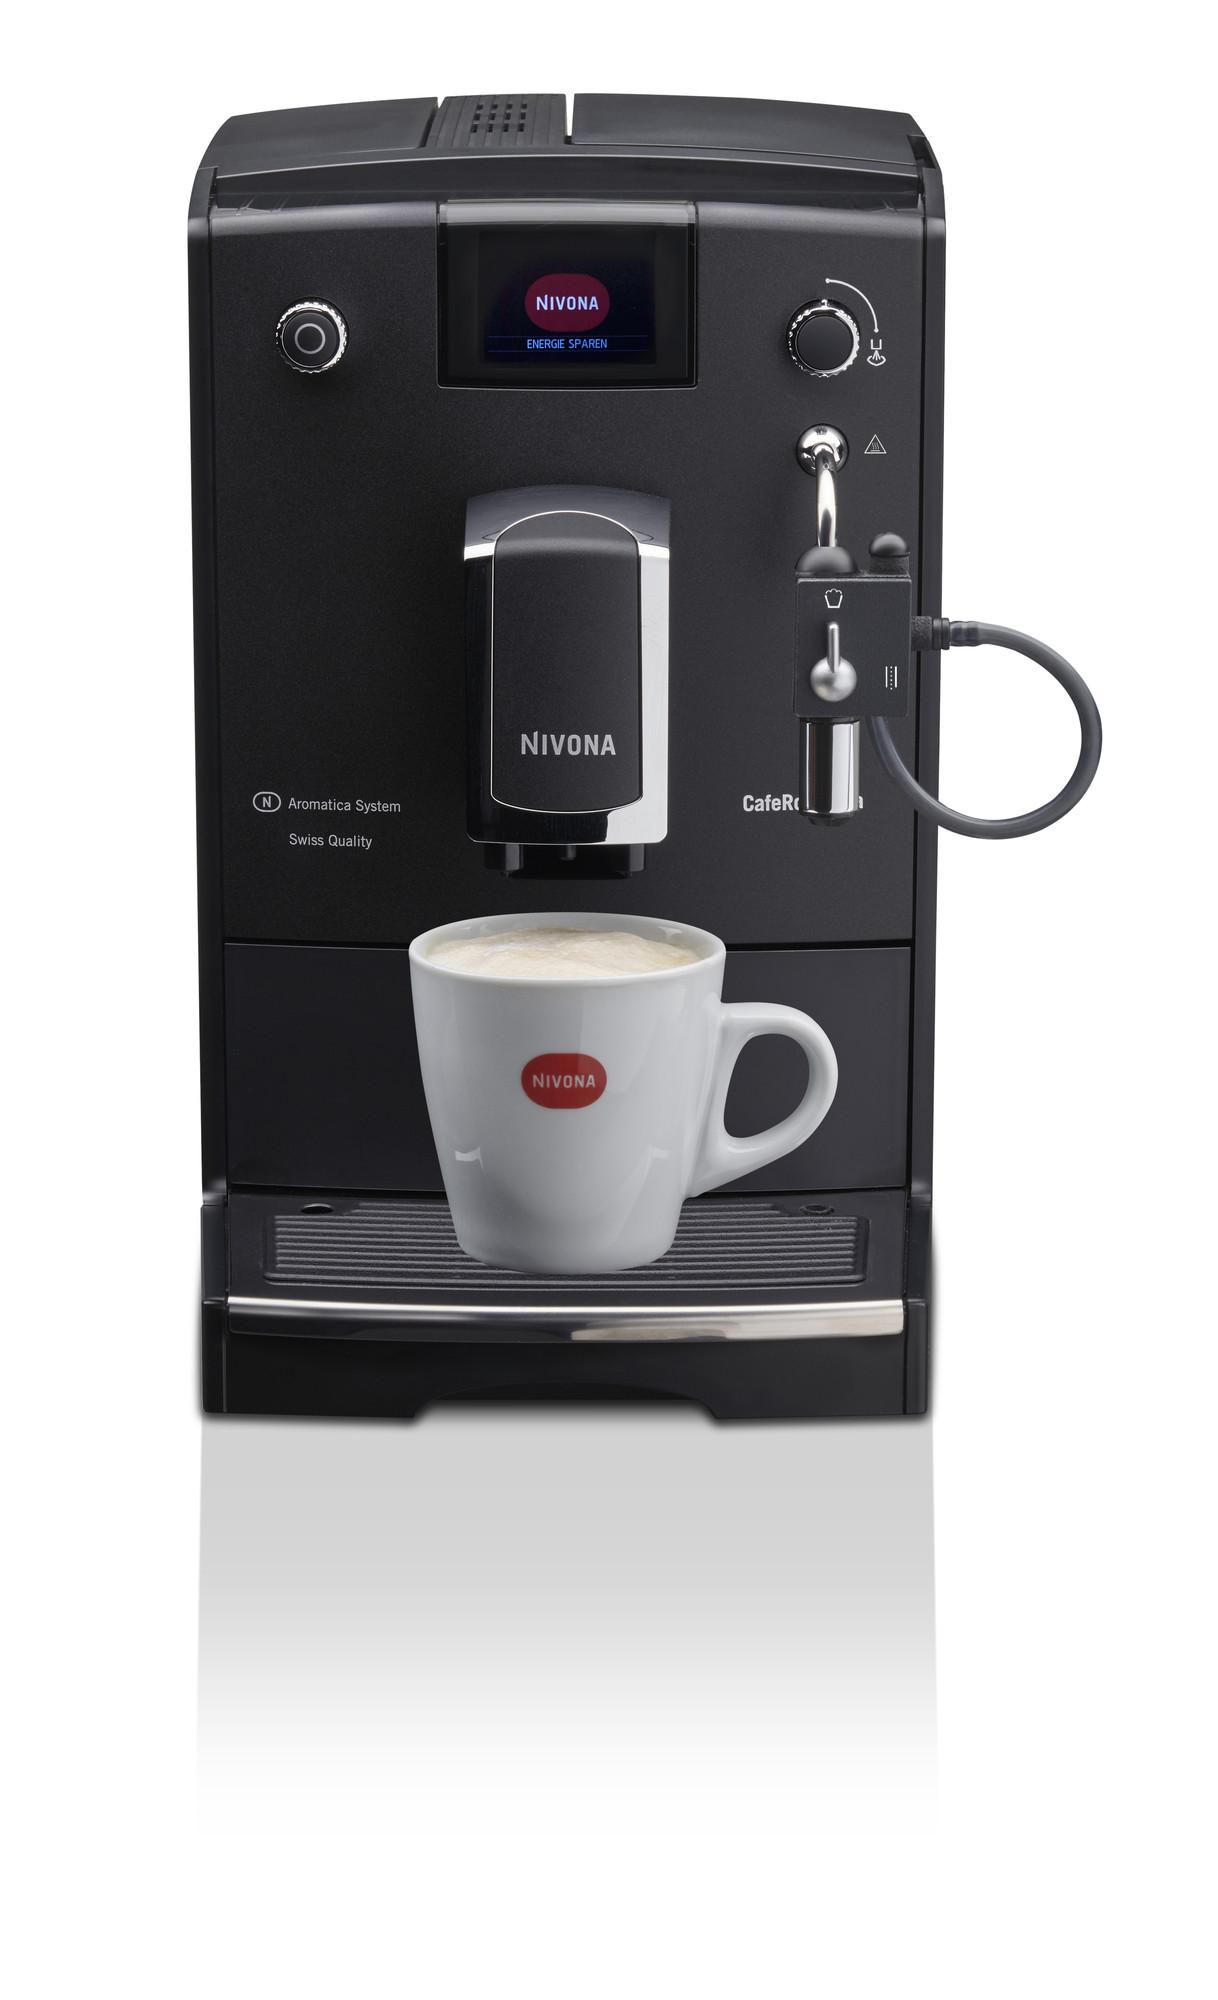 Nivona CafeRomatica 660 Mattschwarz - Chrom NICR660